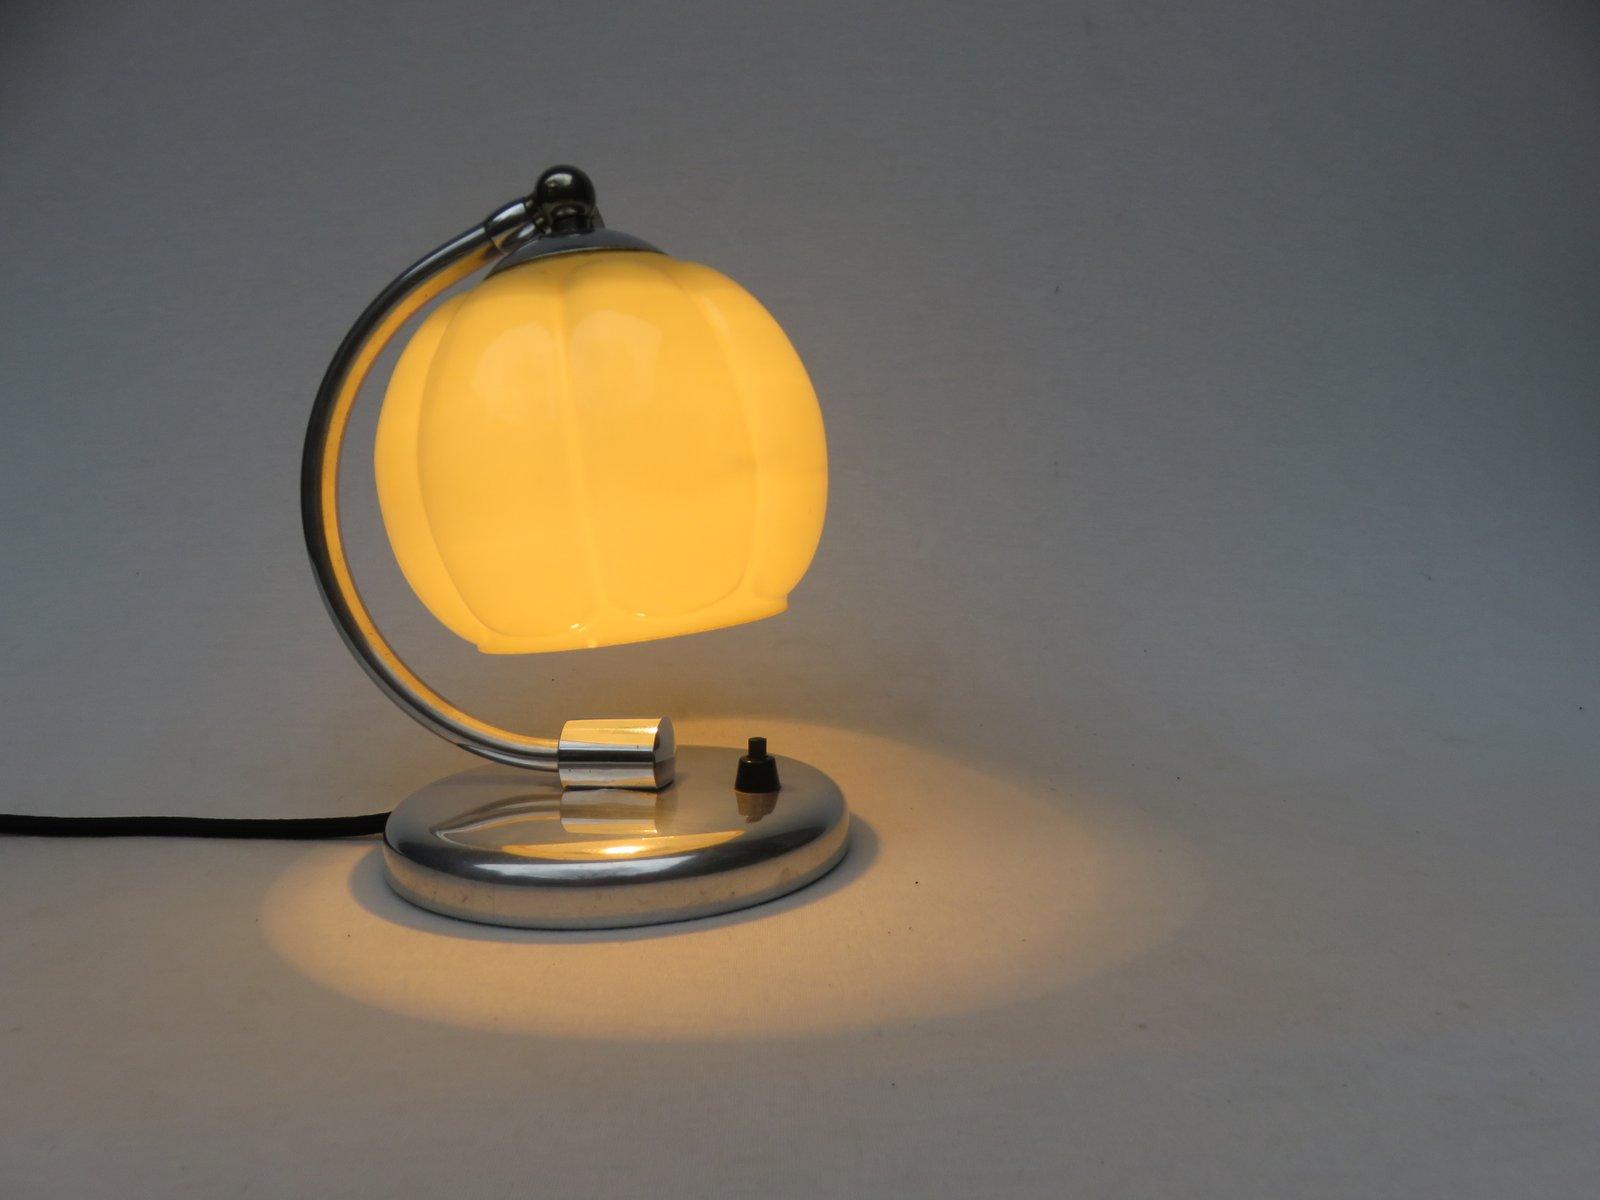 Art déco aluminium nachttisch lampen er set bei pamono kaufen